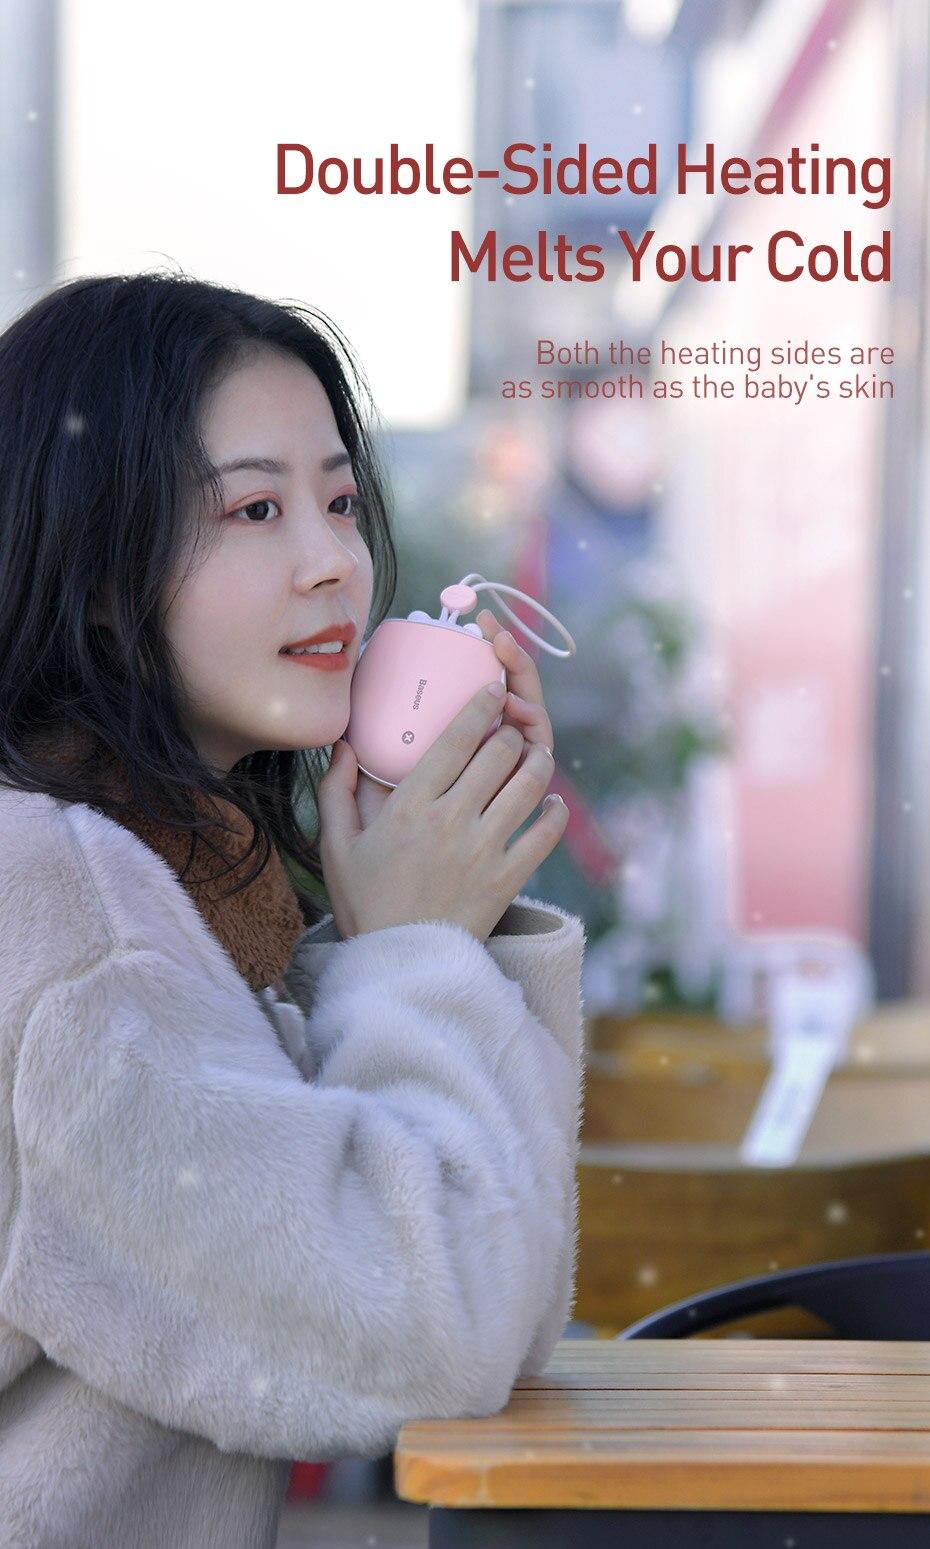 Baseus Heater Rechargeable Hand Warmer 4000 mAh Emergency Power Bank